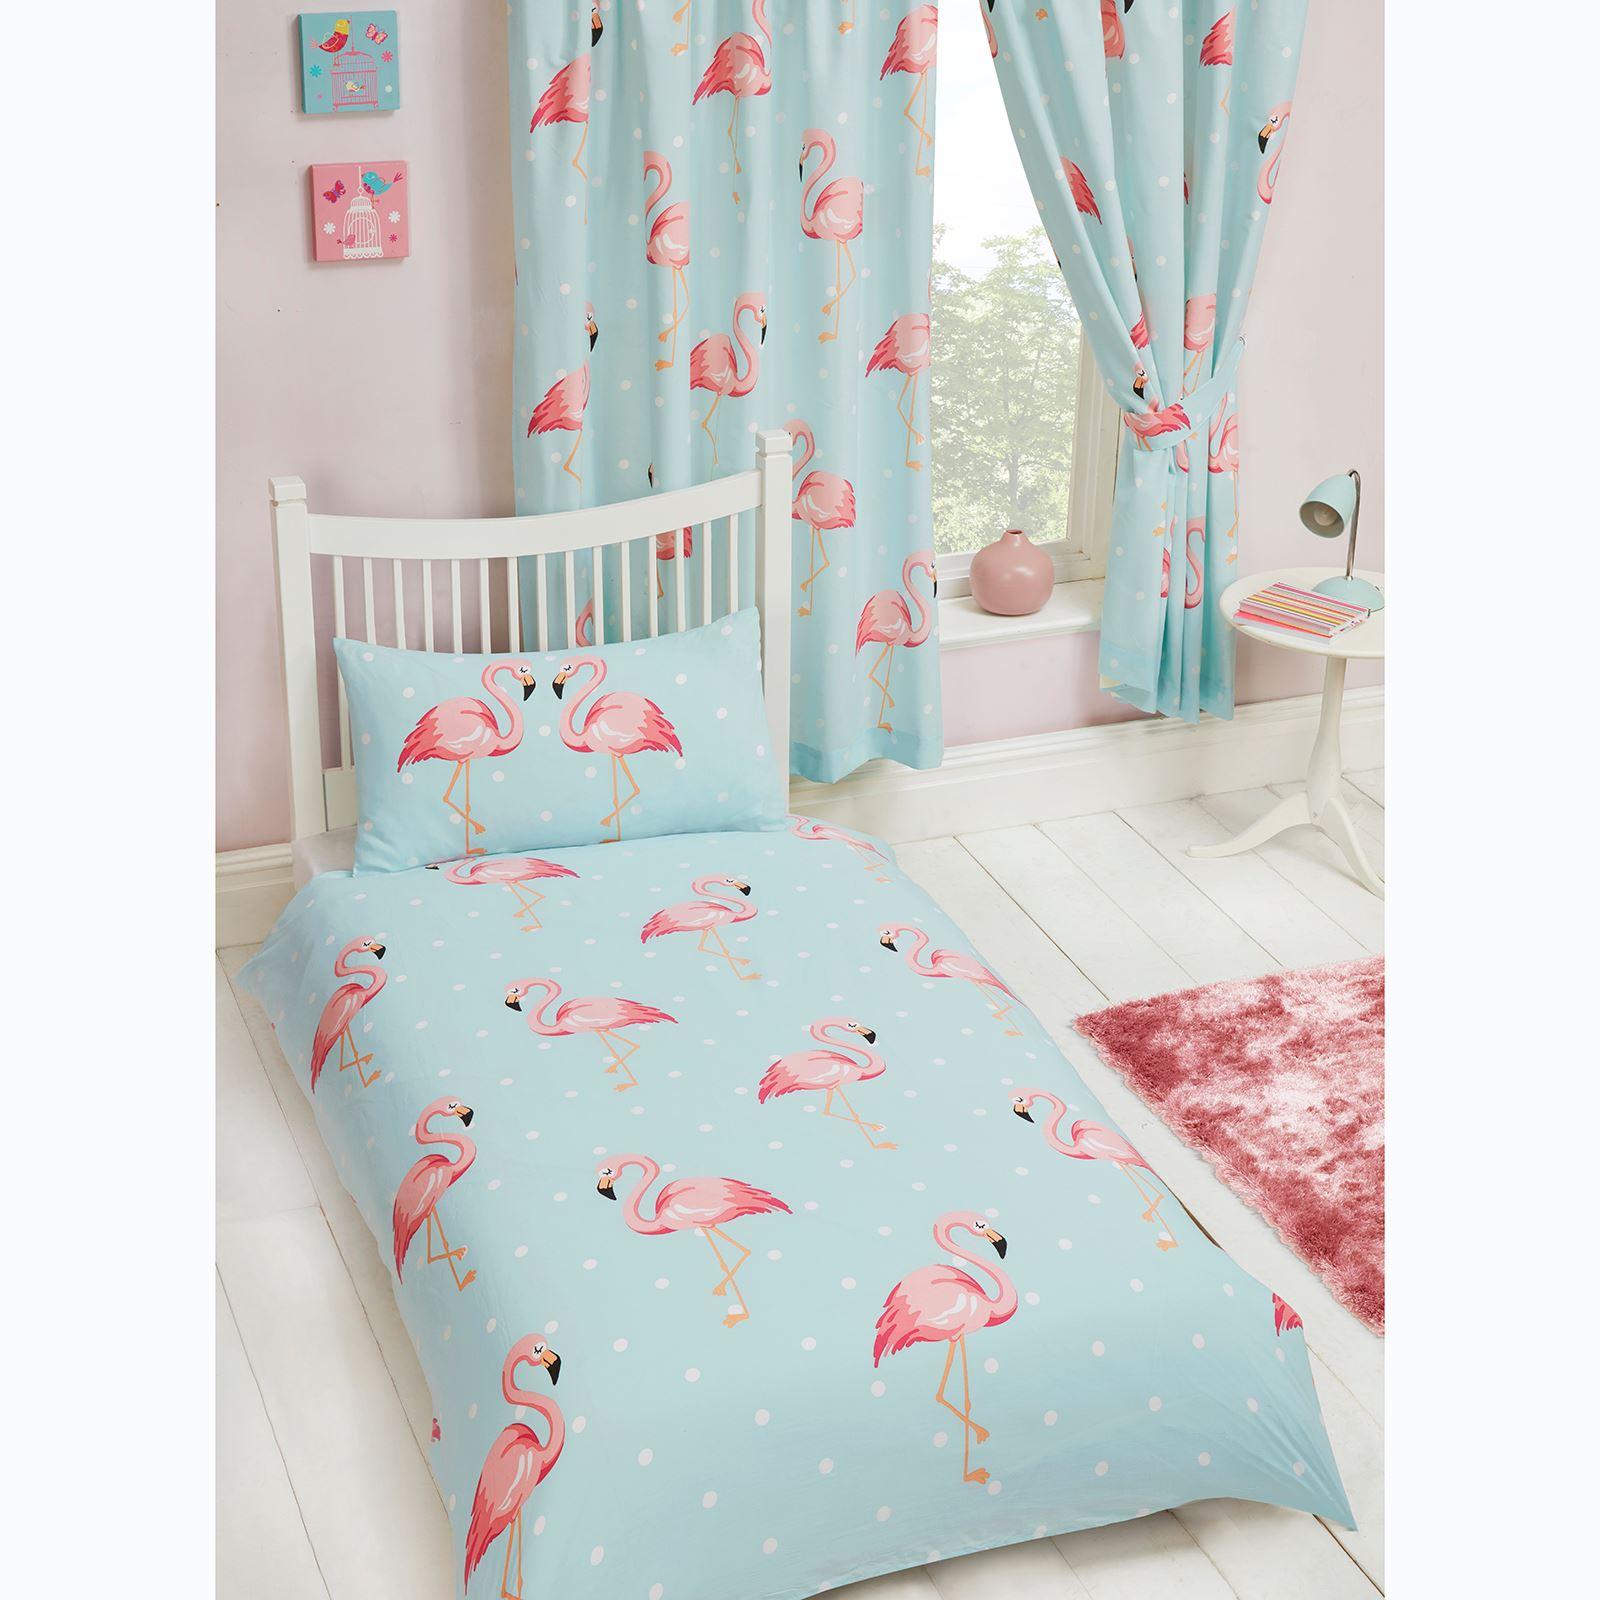 Fifi Flamingo Blue Turquoise Curtains Lined 66 Quot X 72 Quot Kids